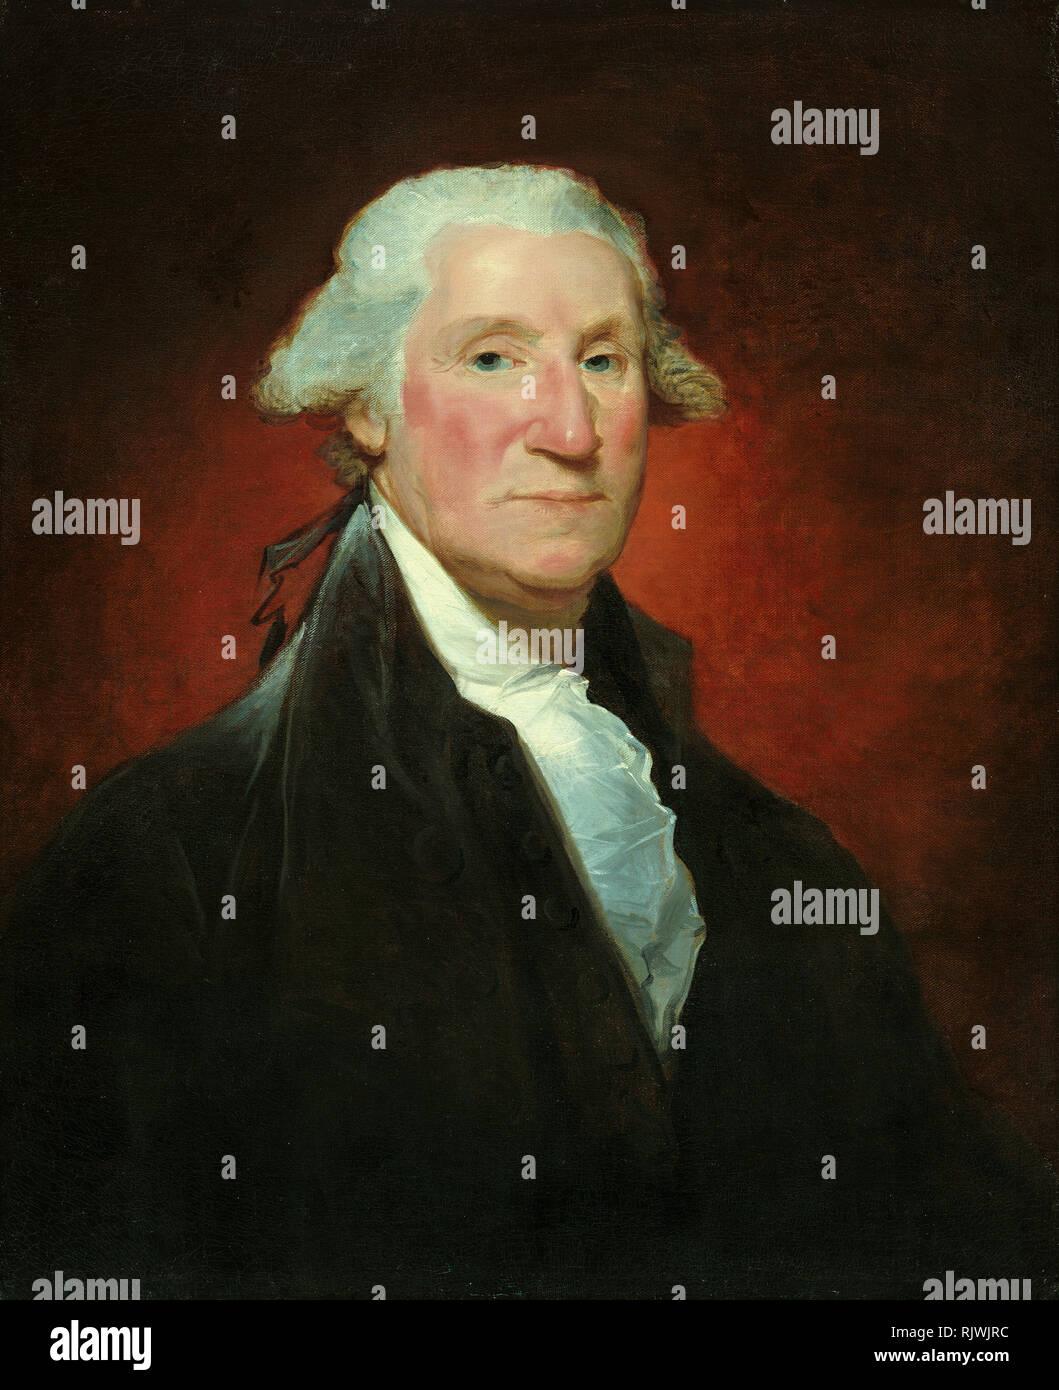 George Washington (Vaughan portrait), painting by Gilbert Stuart 1795 - Stock Image